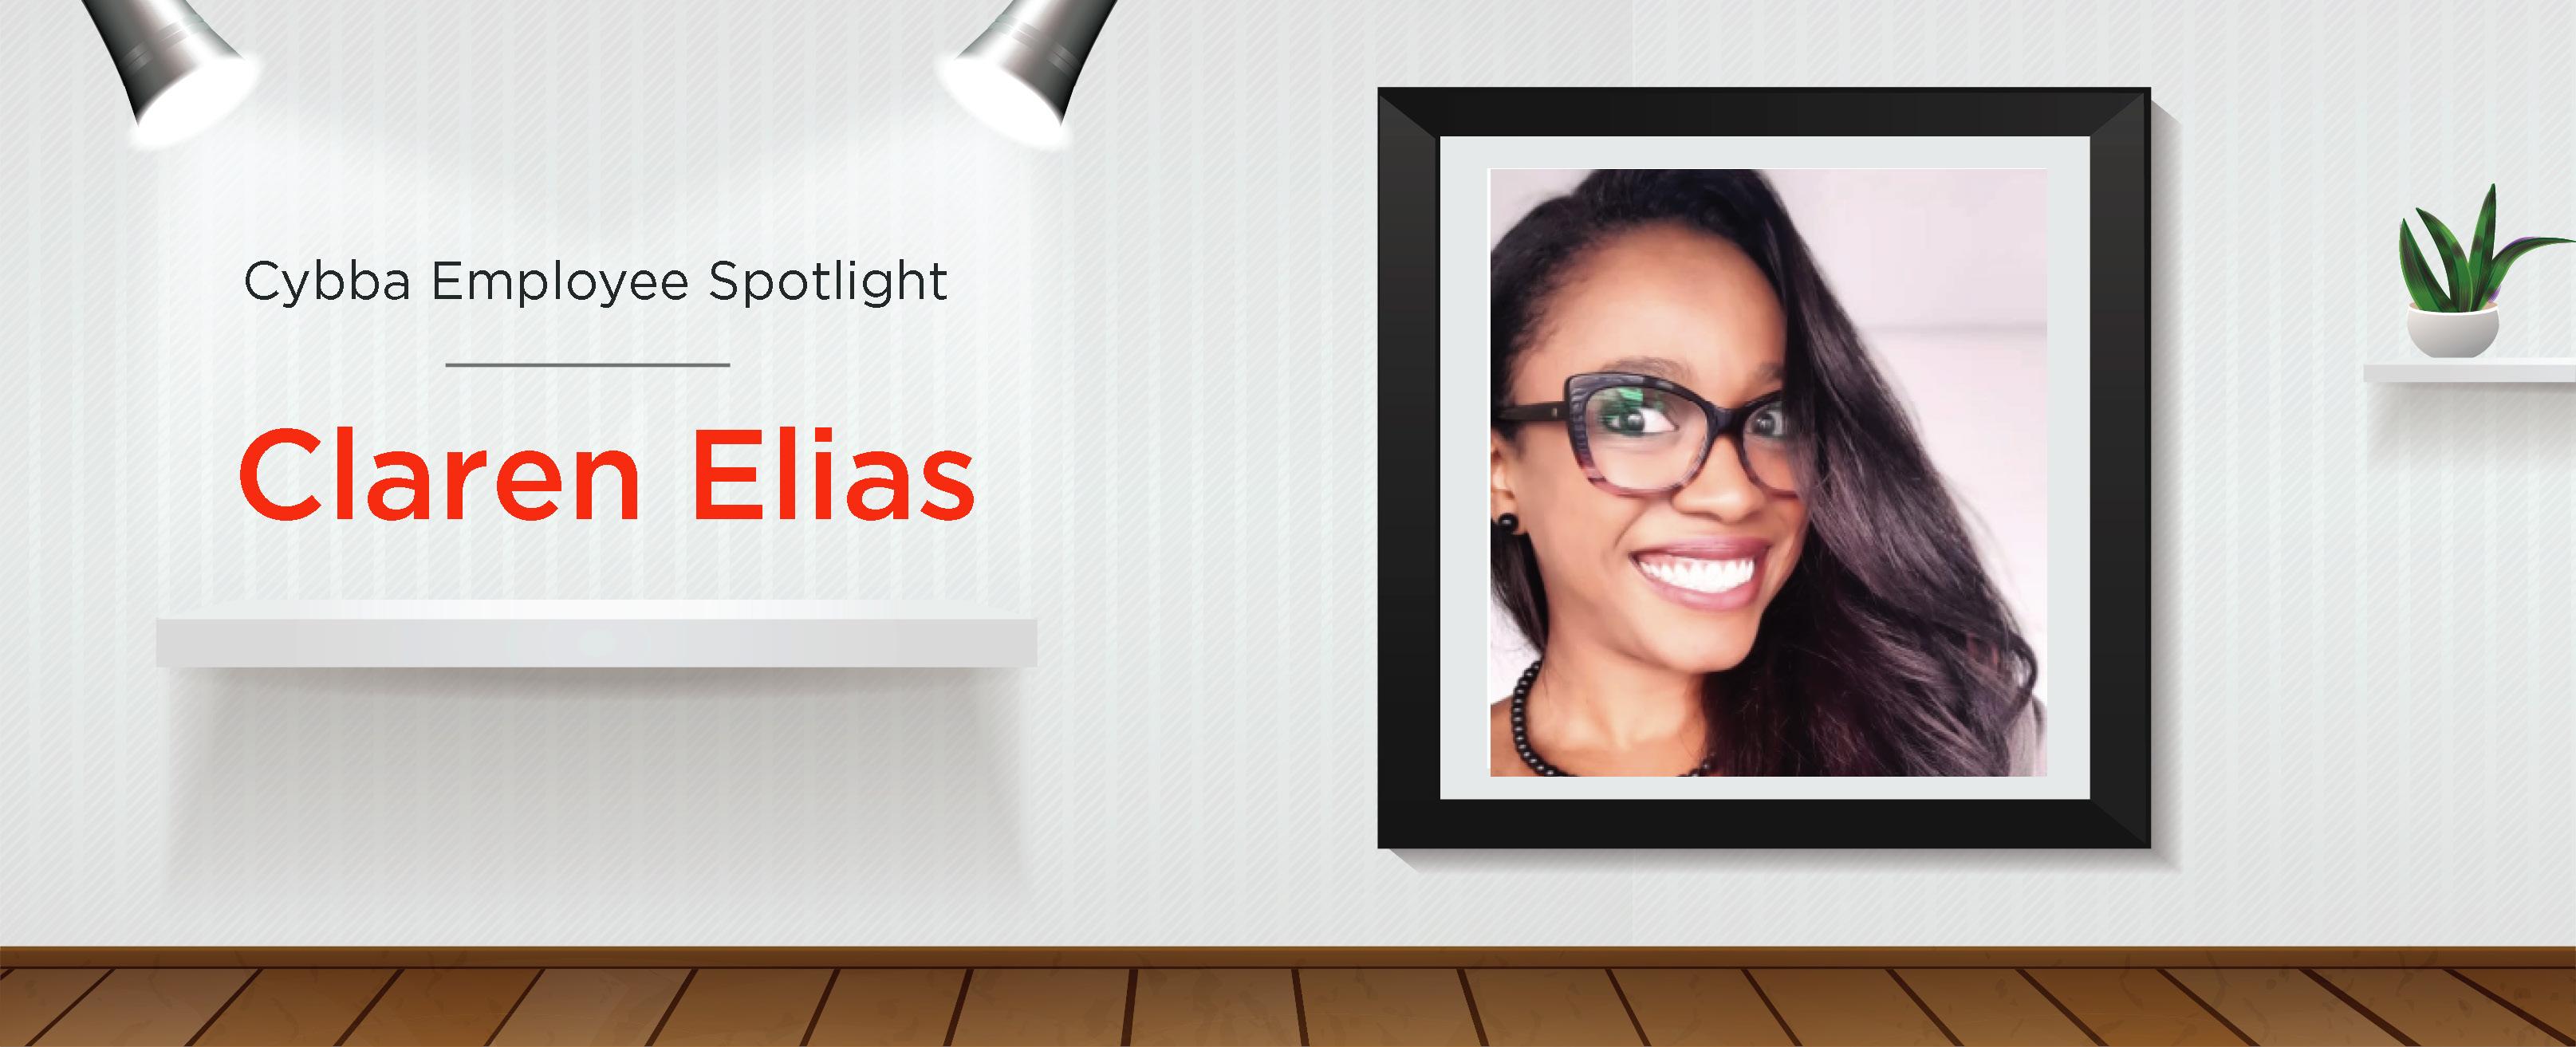 EmployeeSpotlight_Claren